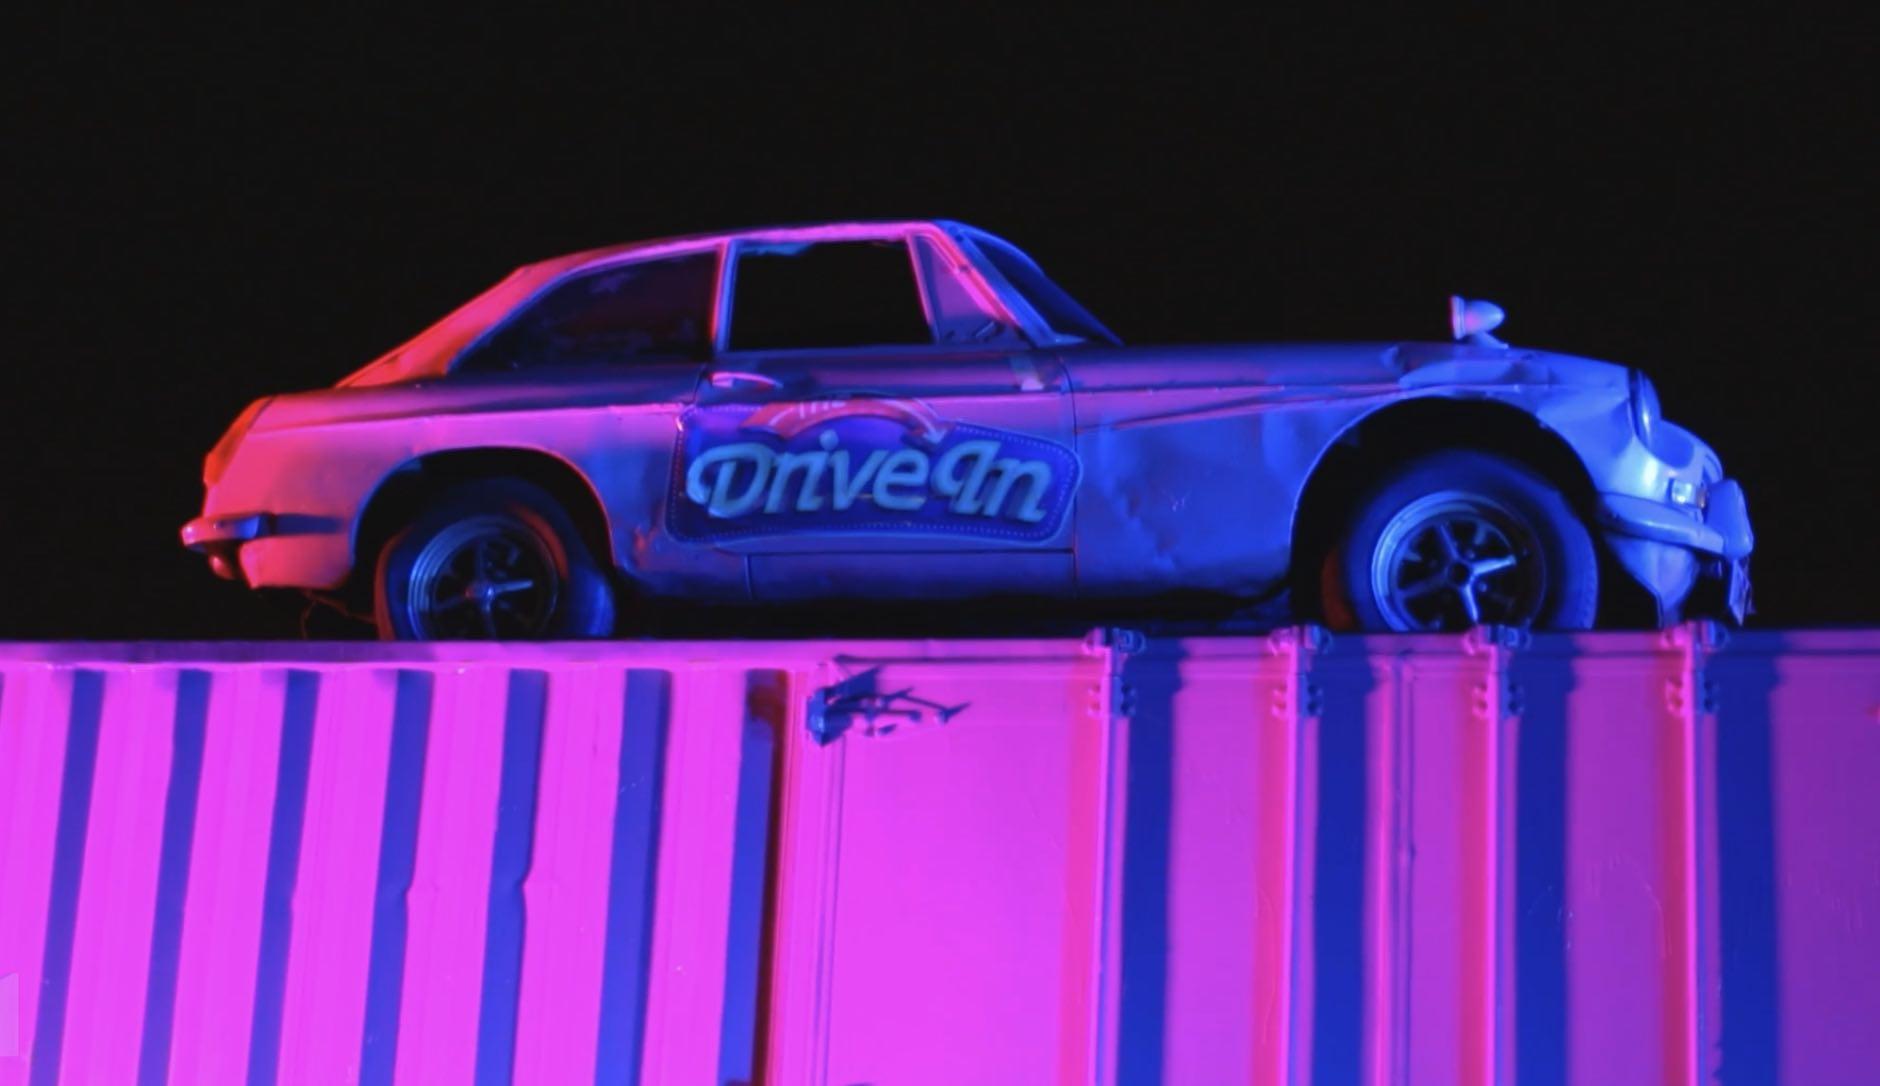 Millennium Drive In